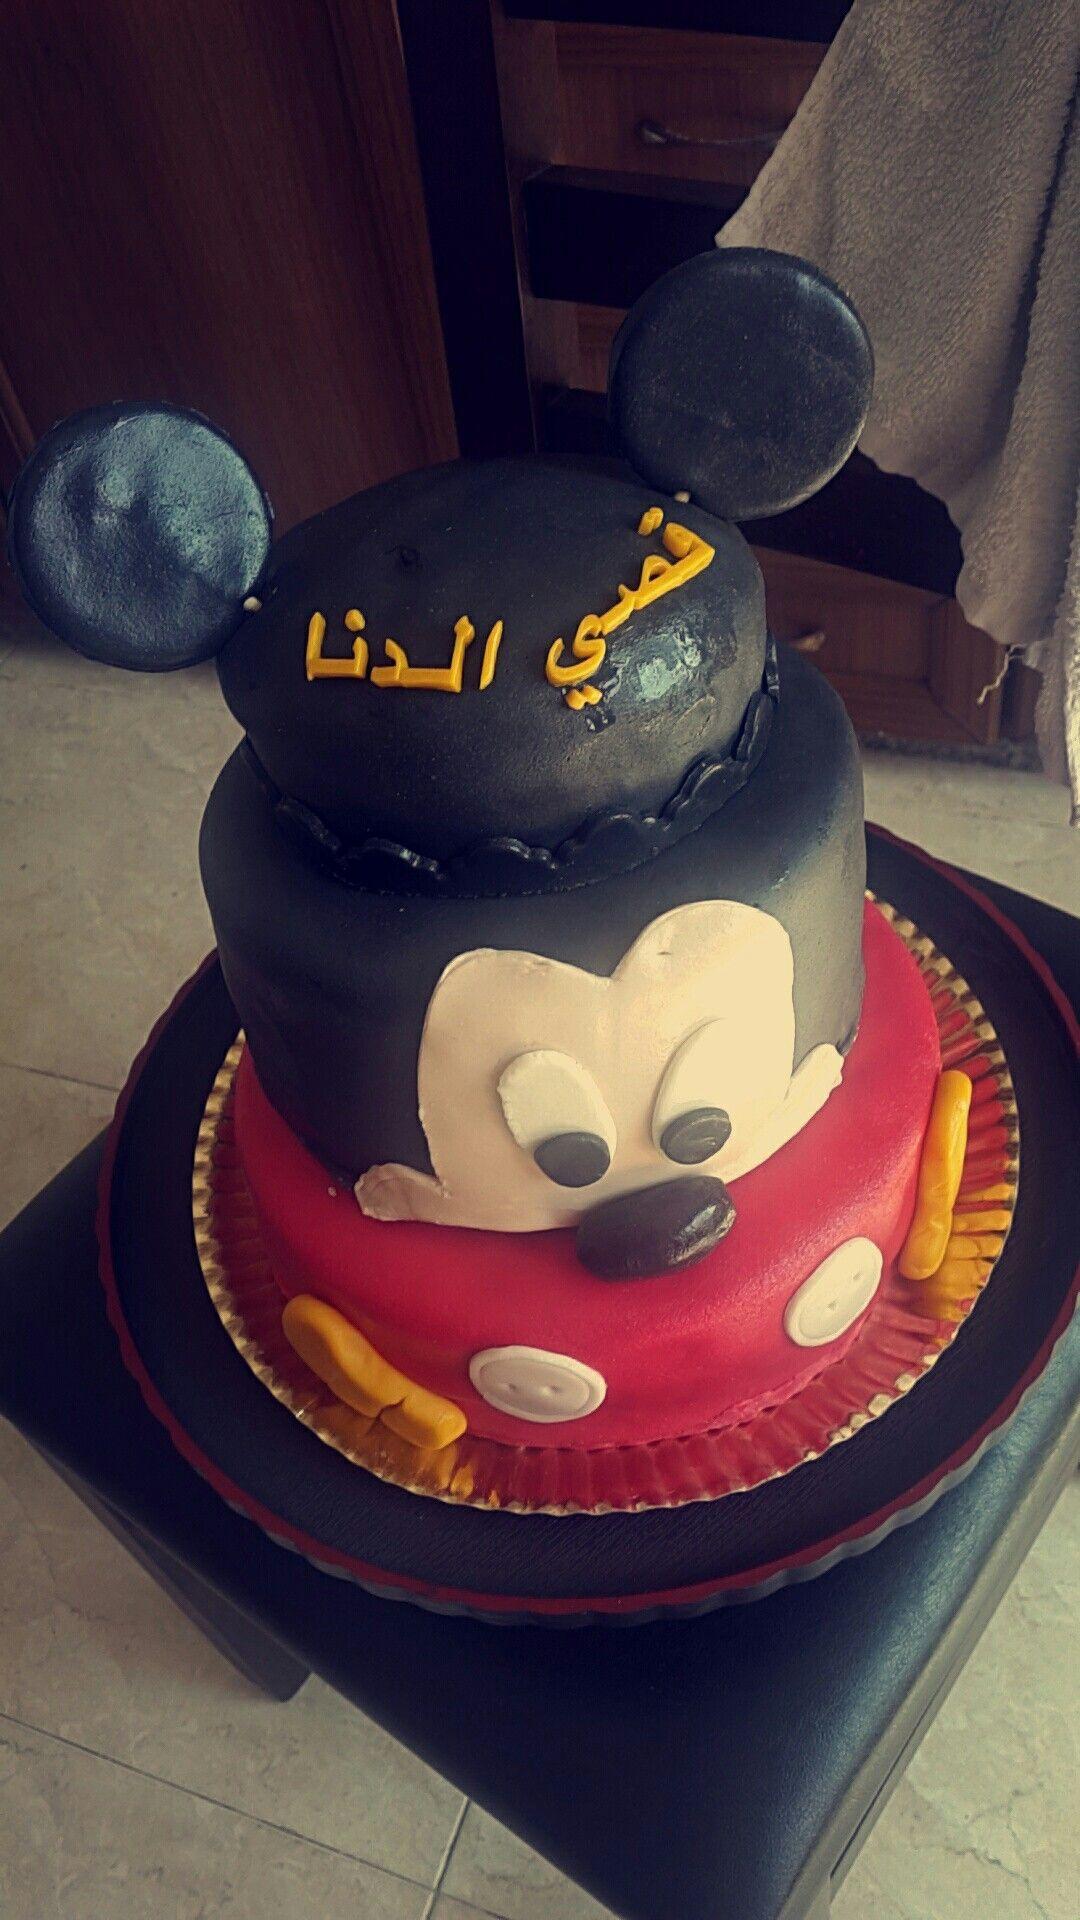 Mickeymouse Cake ميكي ماوس كيك فوندانت عجينة السكر قصي